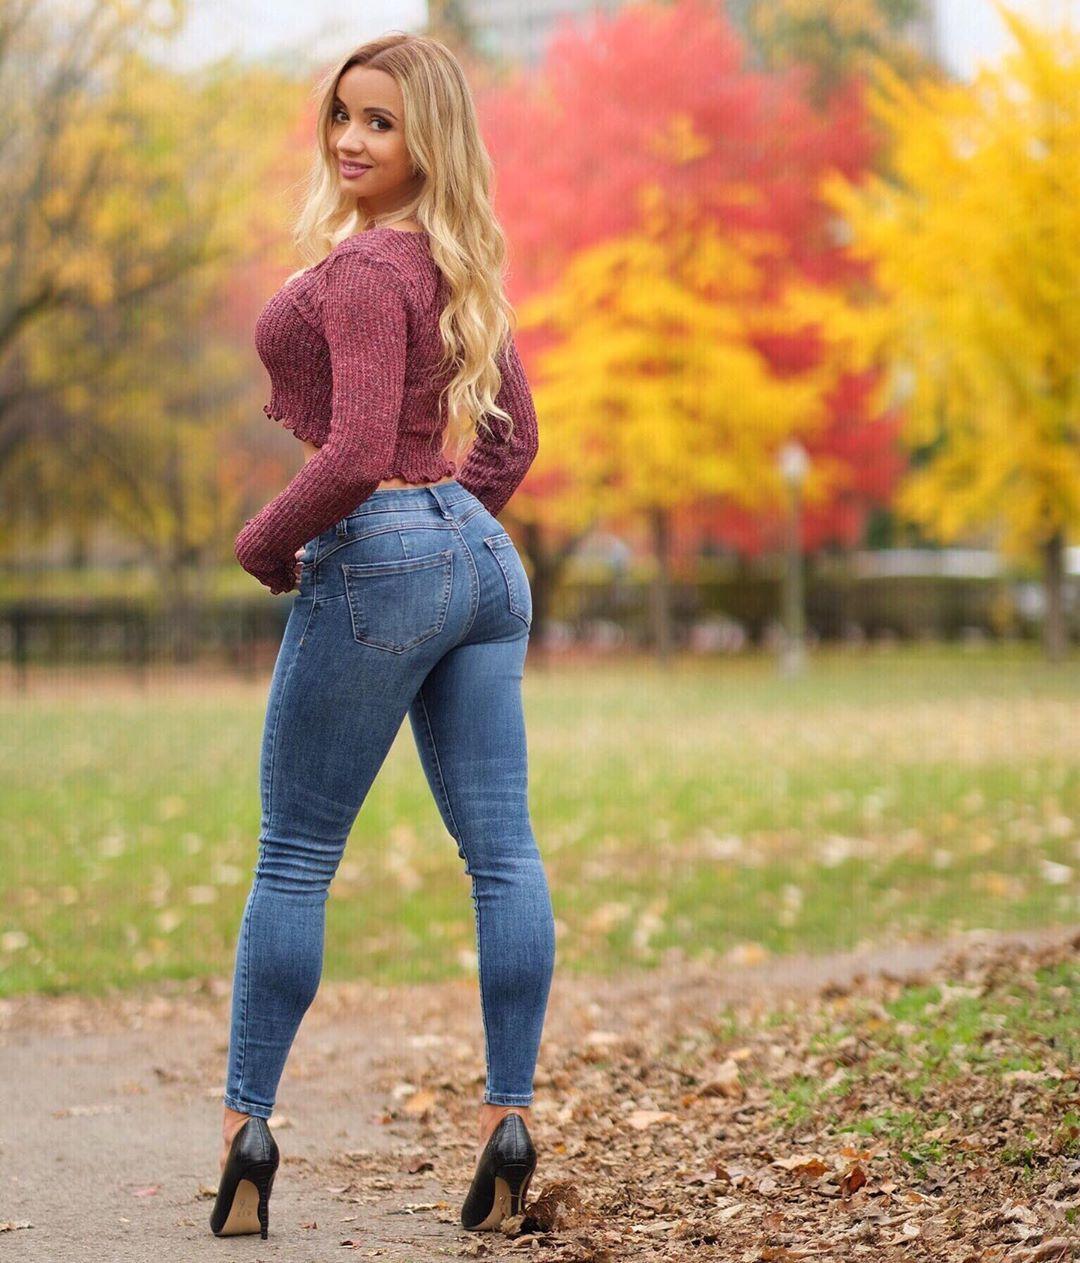 Yulia-Kay-Wallpapers-Insta-Fit-Bio-5